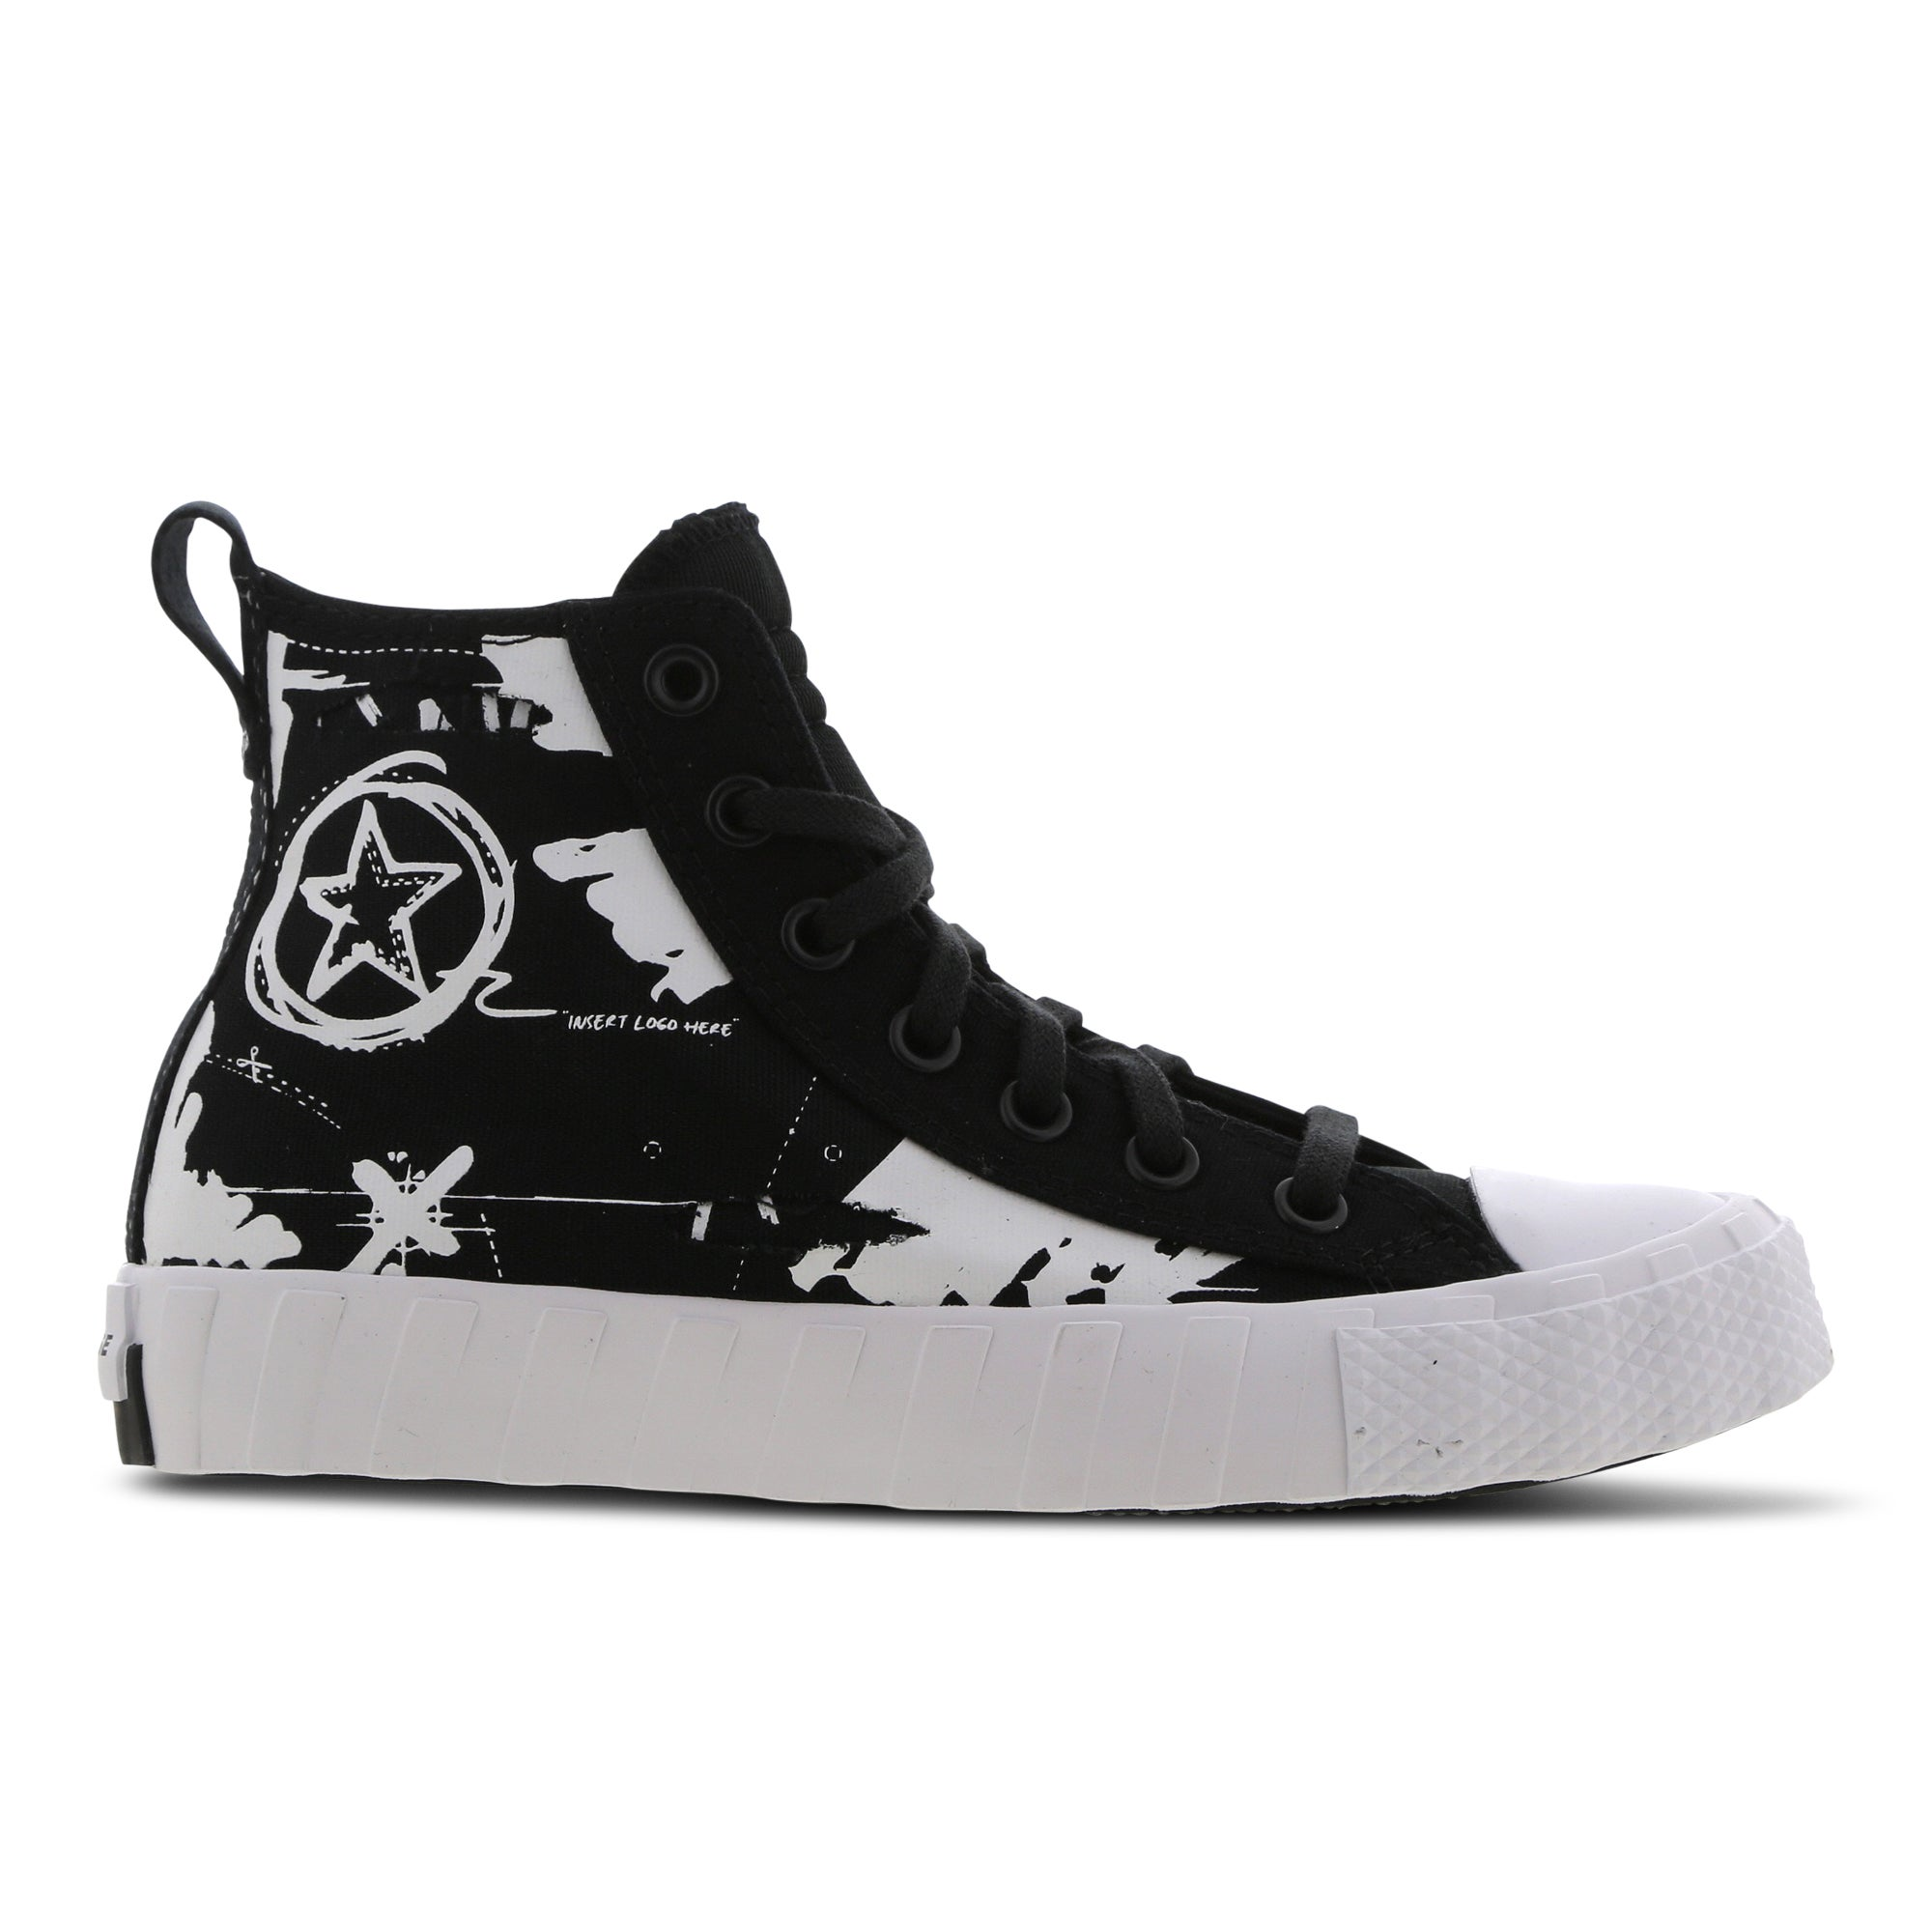 Converse UNT1TL3D Schoenen